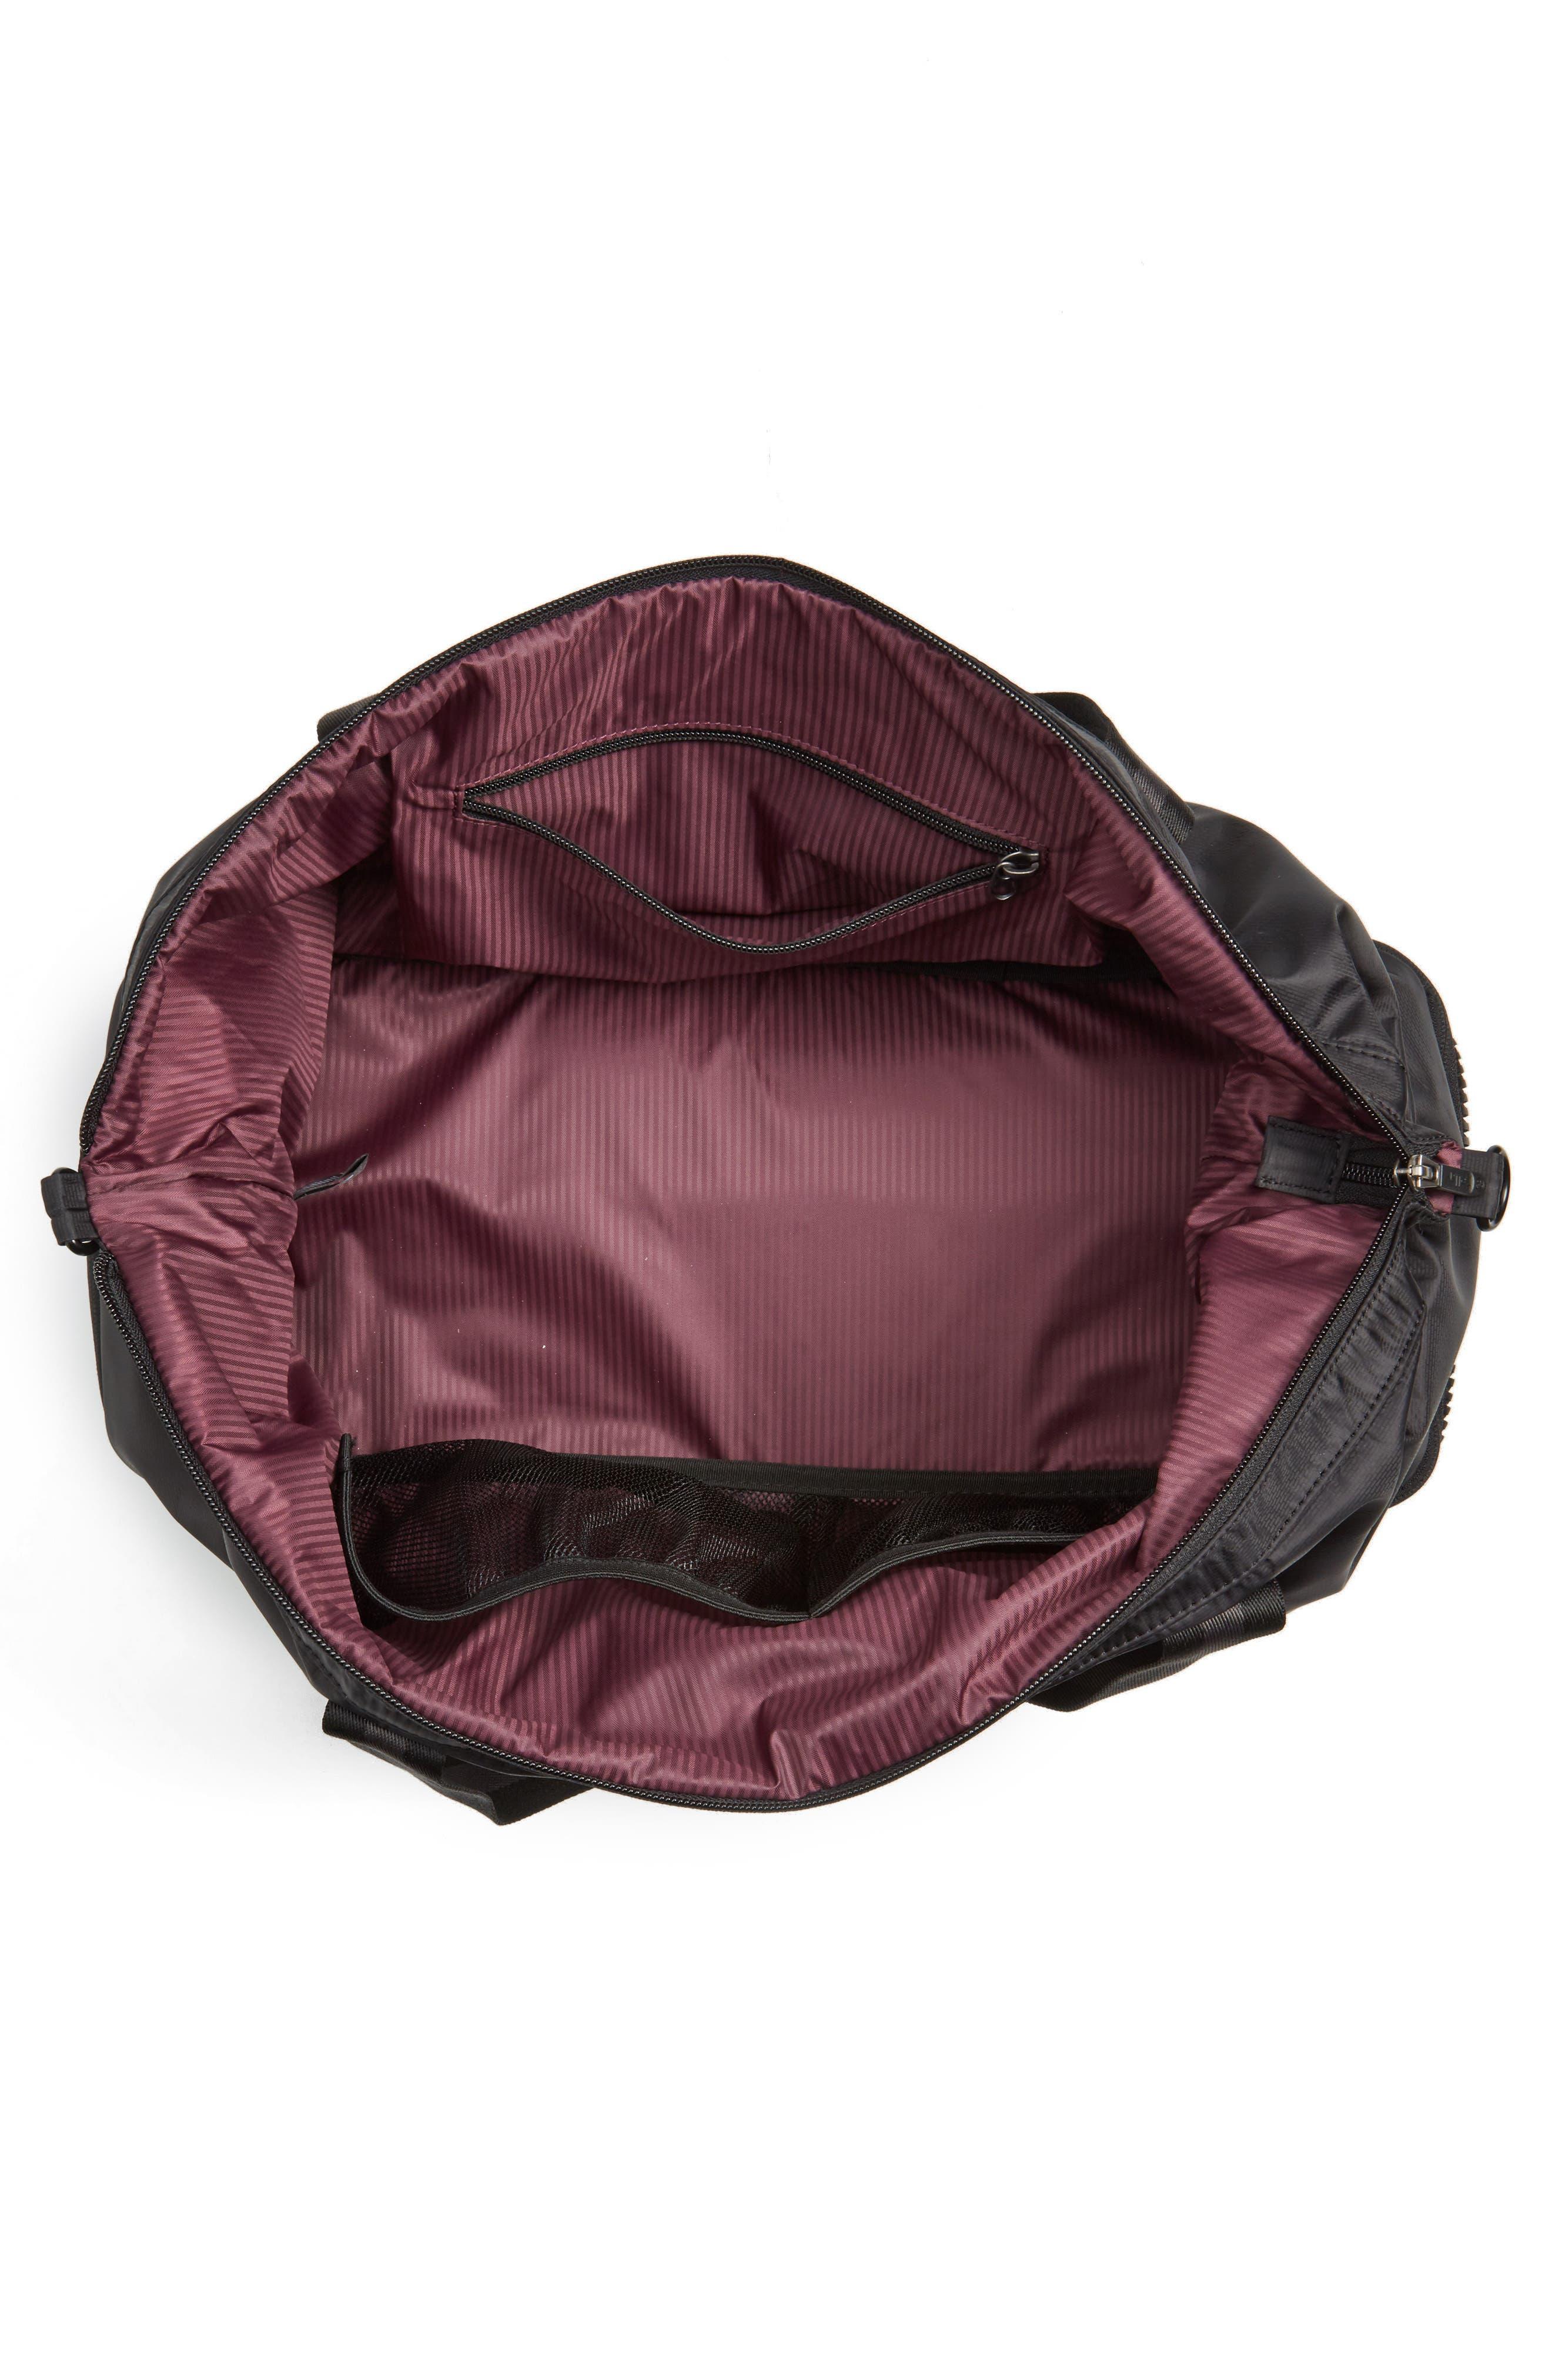 Alcove Duffel Bag,                             Alternate thumbnail 4, color,                             001